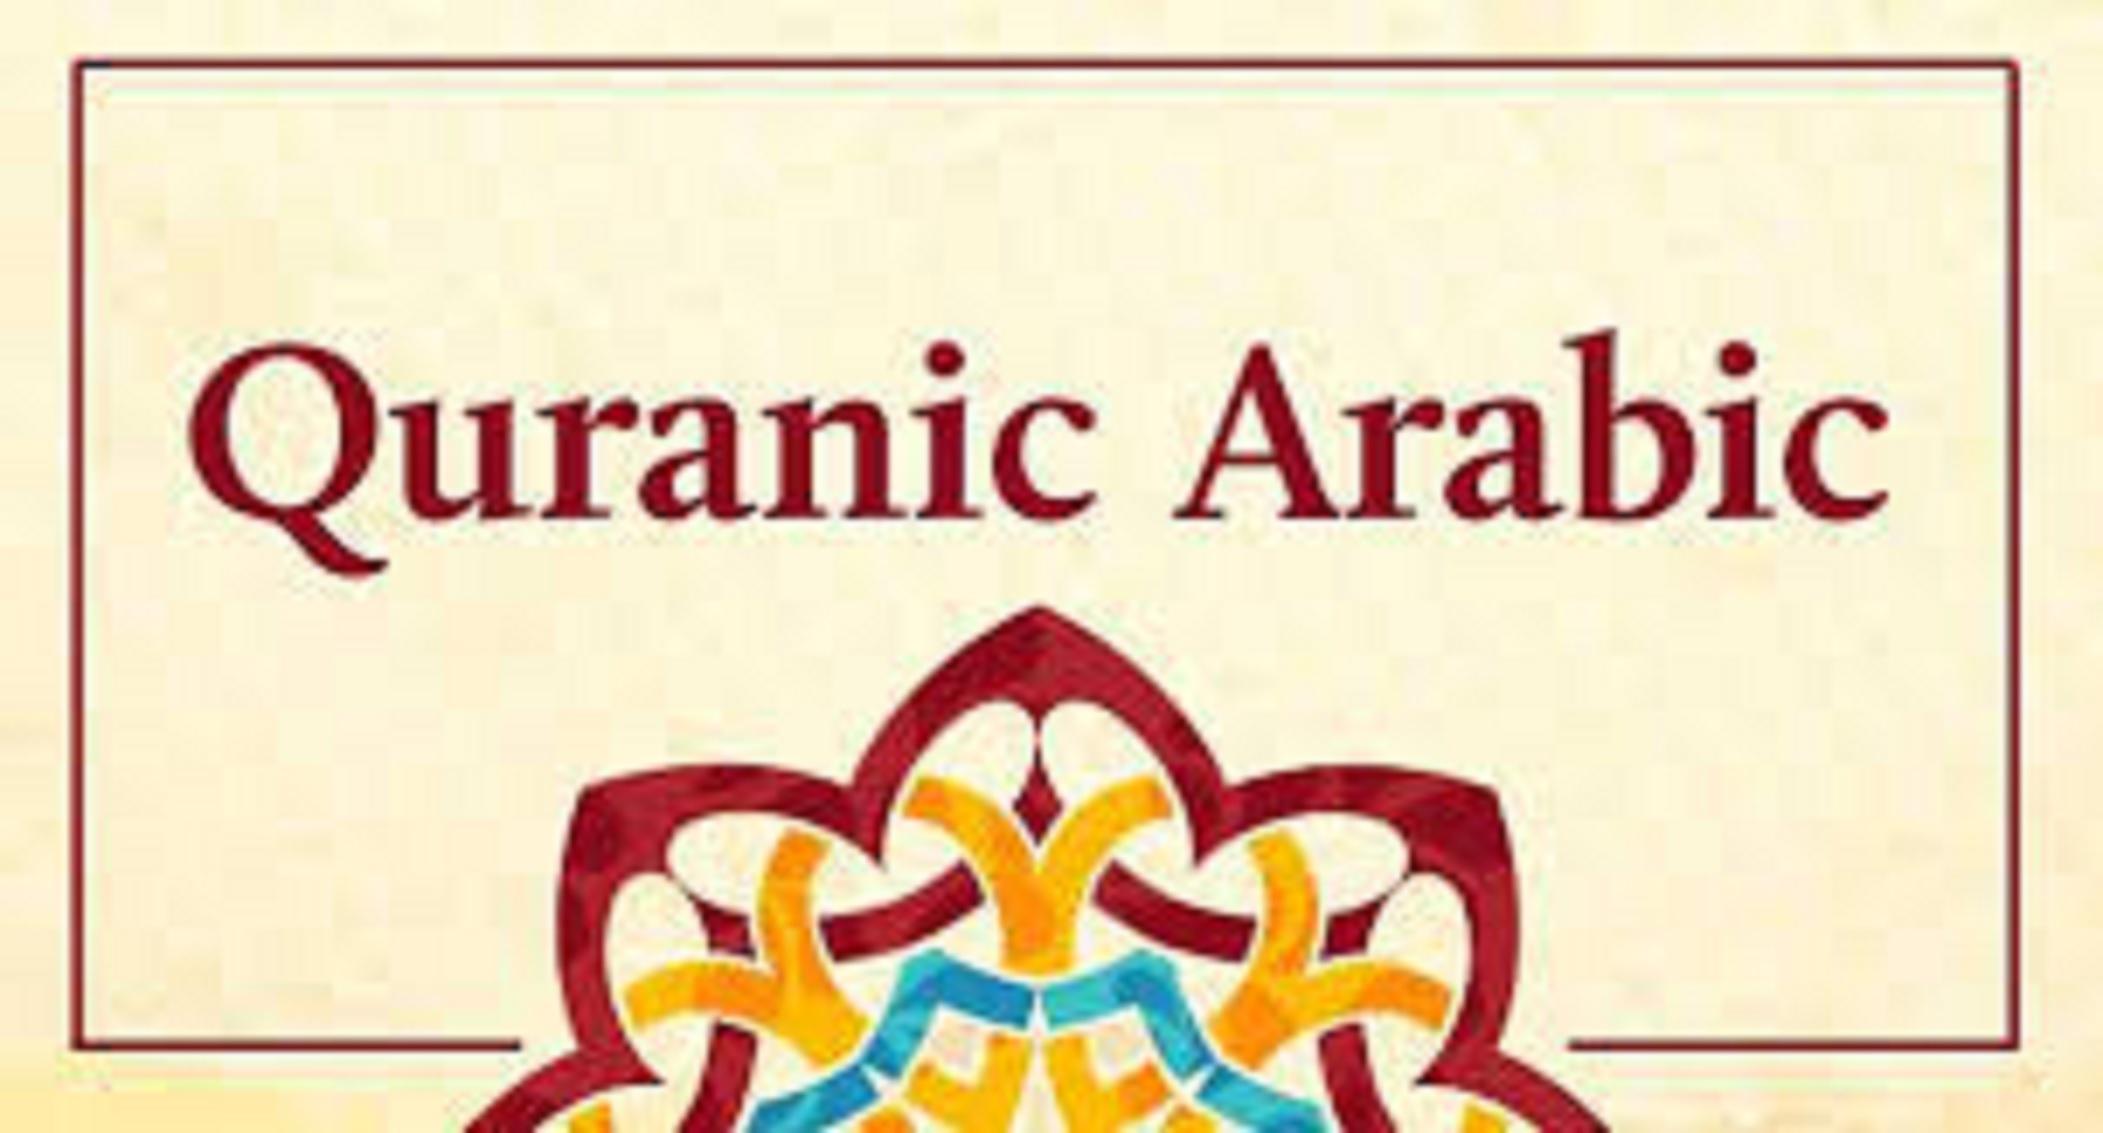 Learn Quranic Arabic with Tafseer